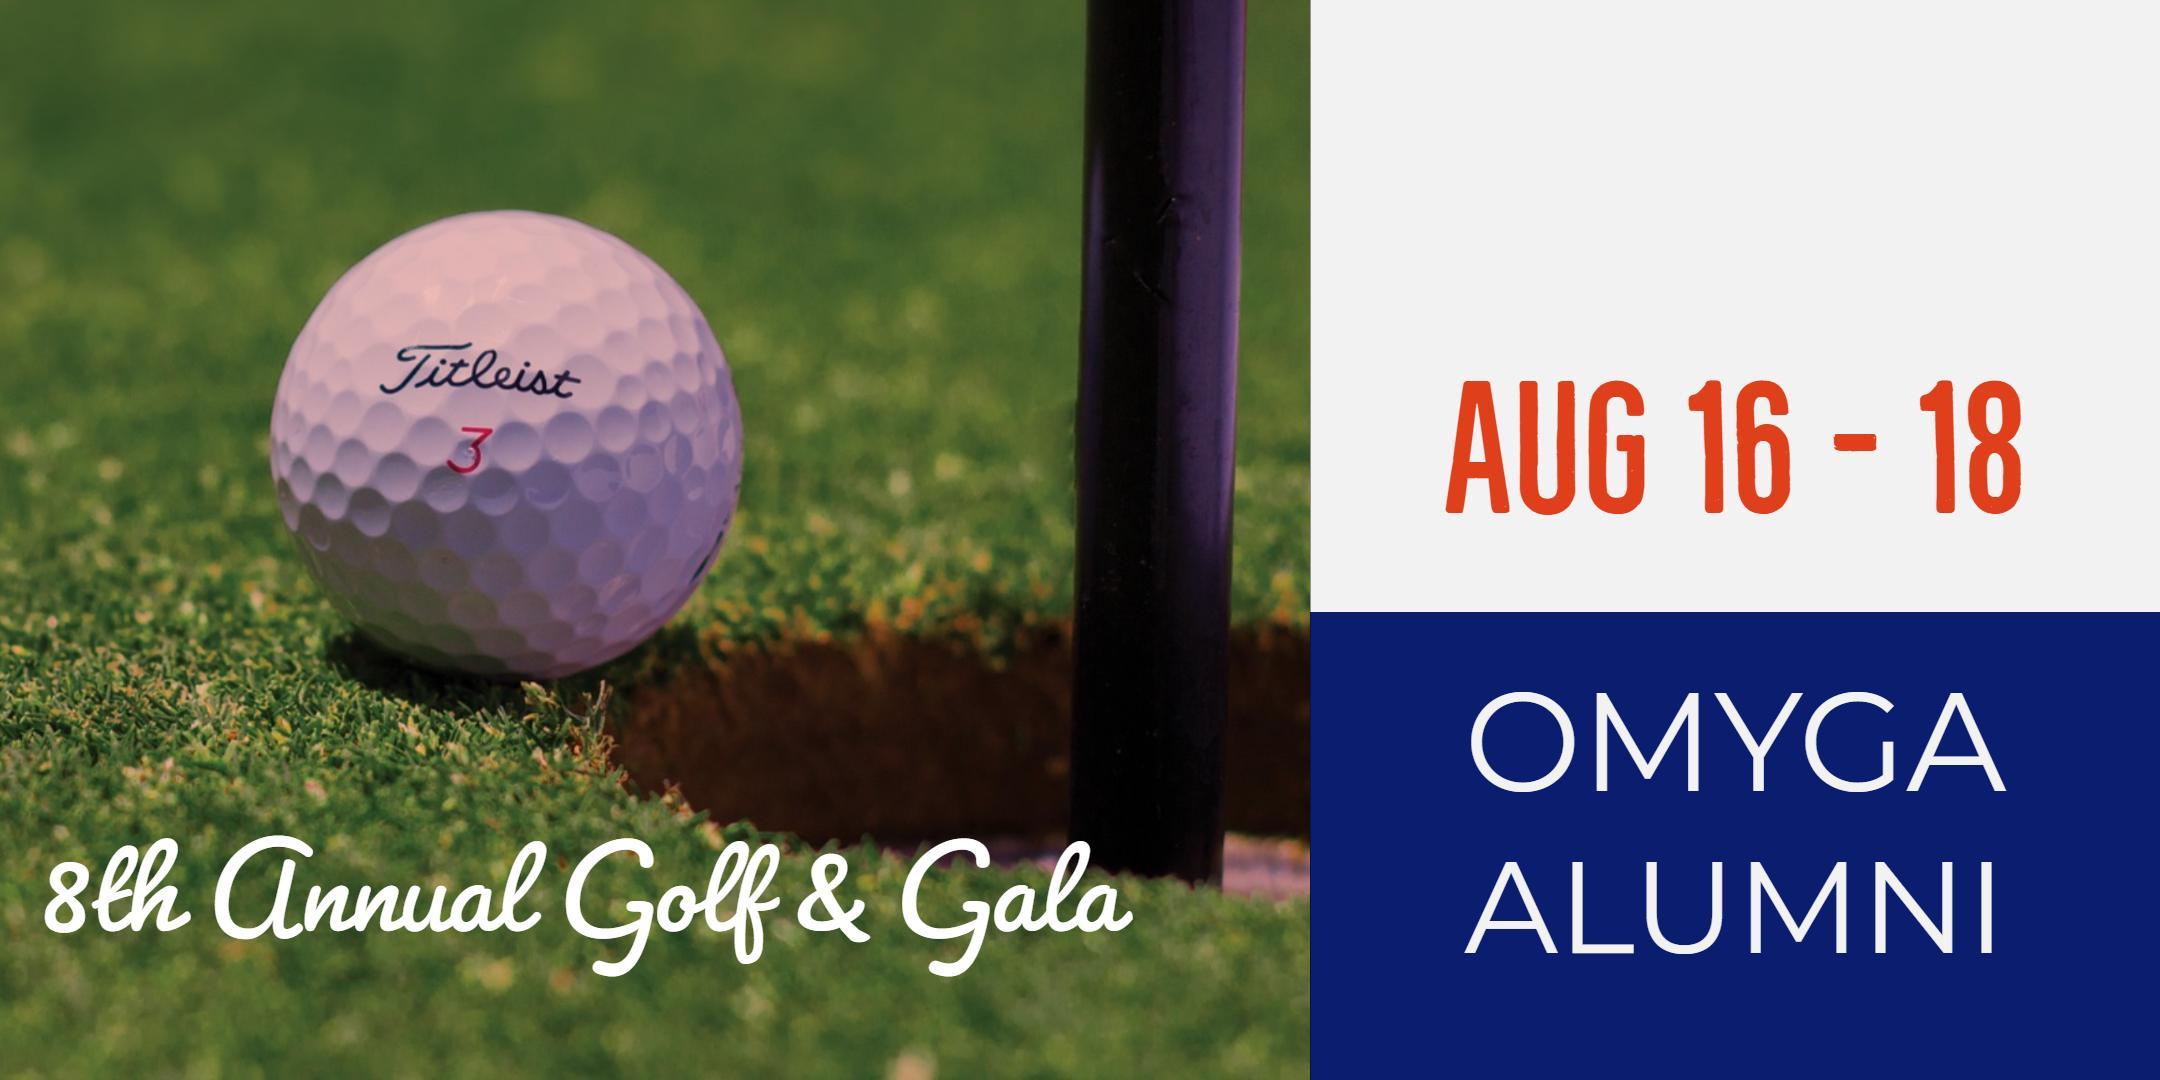 The 8th Annual OMYGA Alumni Golf & Gala Event